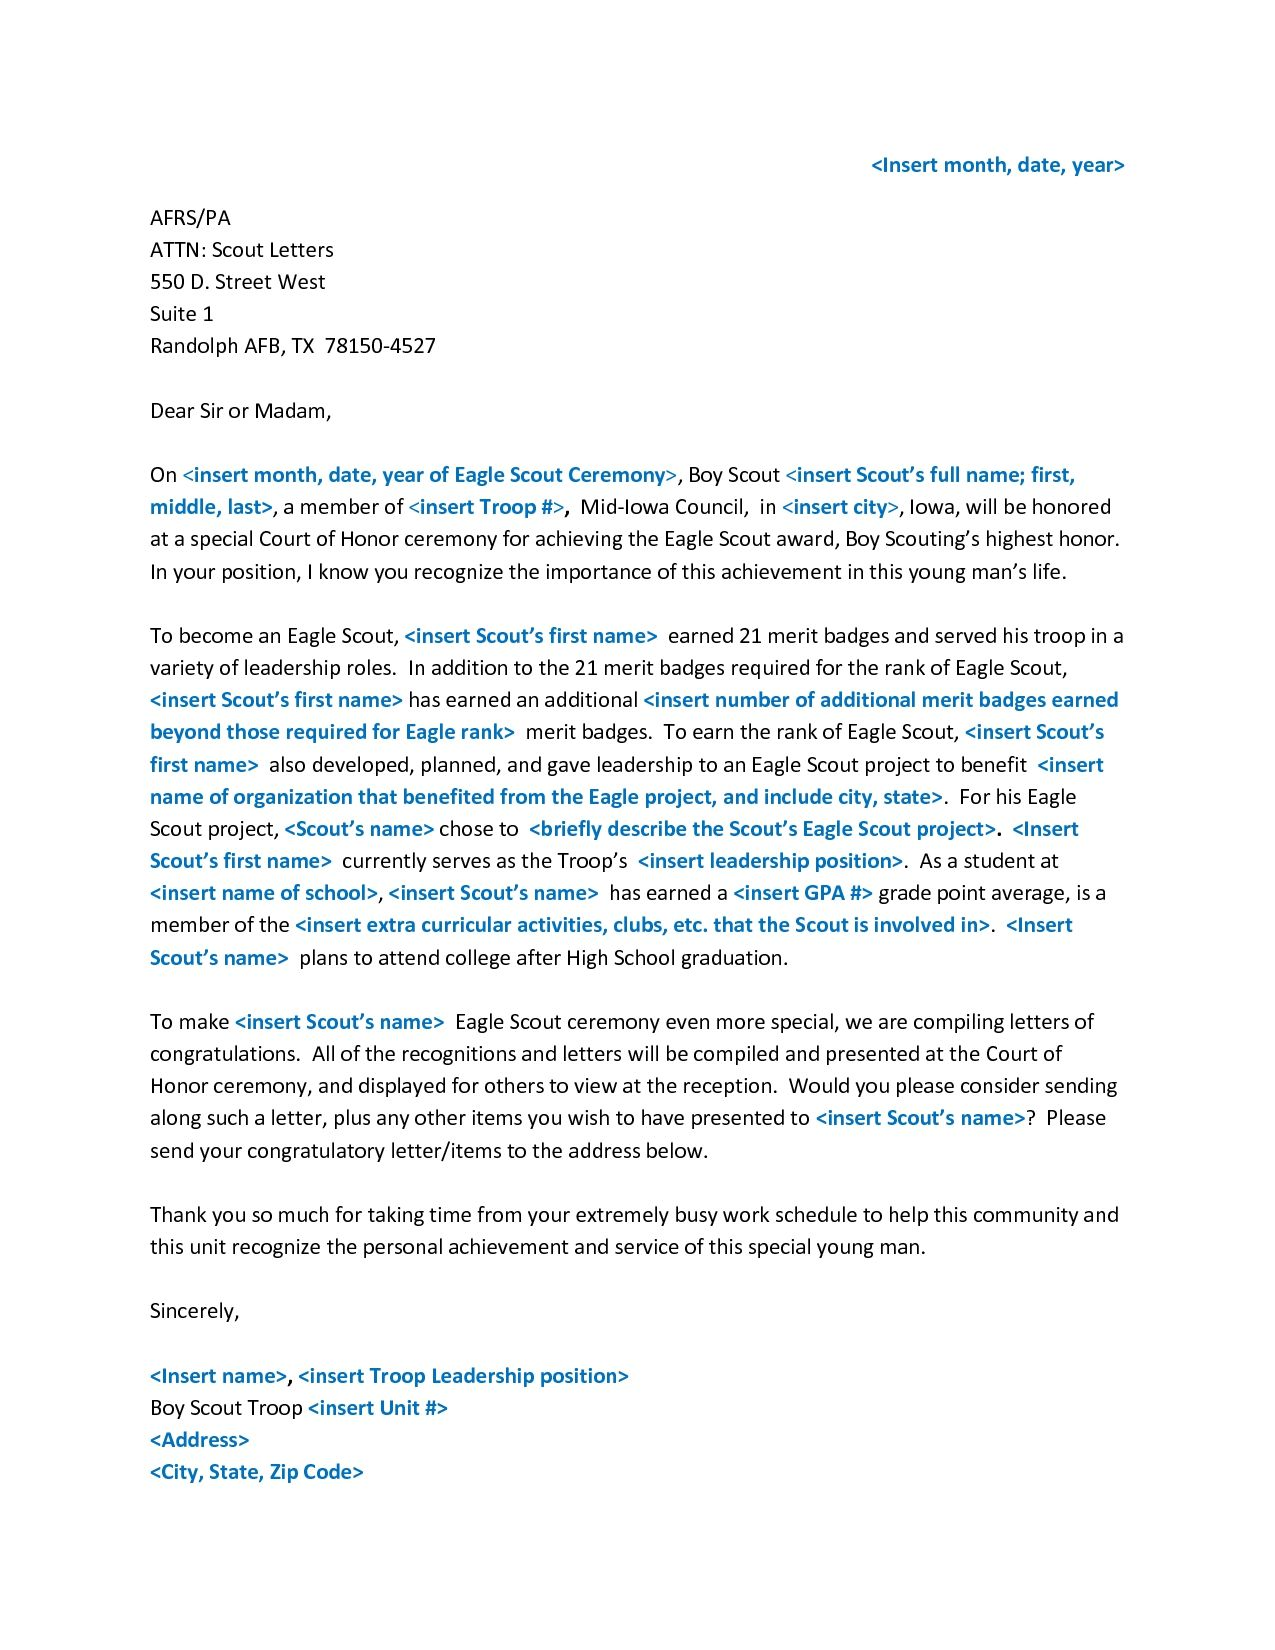 Eagle scout recommendation letter template resume cover news to go eagle scout recommendation letter template resume cover expocarfo Choice Image